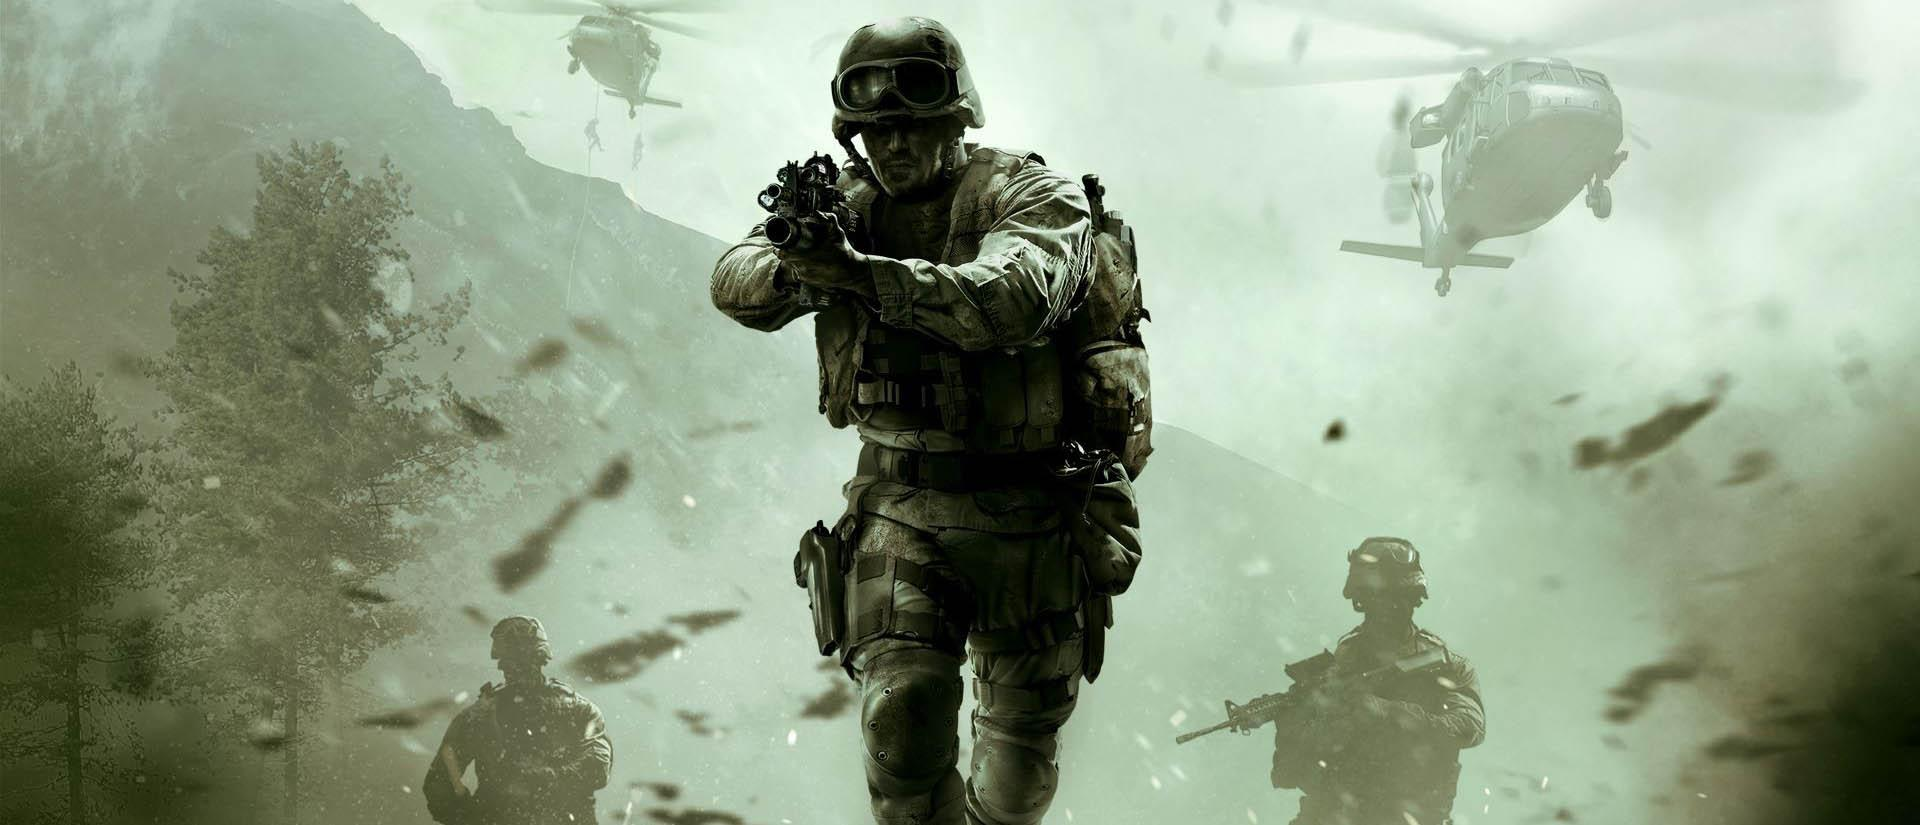 Activision zeigtunabsichtlich neuen Call-of-Duty-Ableger vor der offiziellen Enthüllung